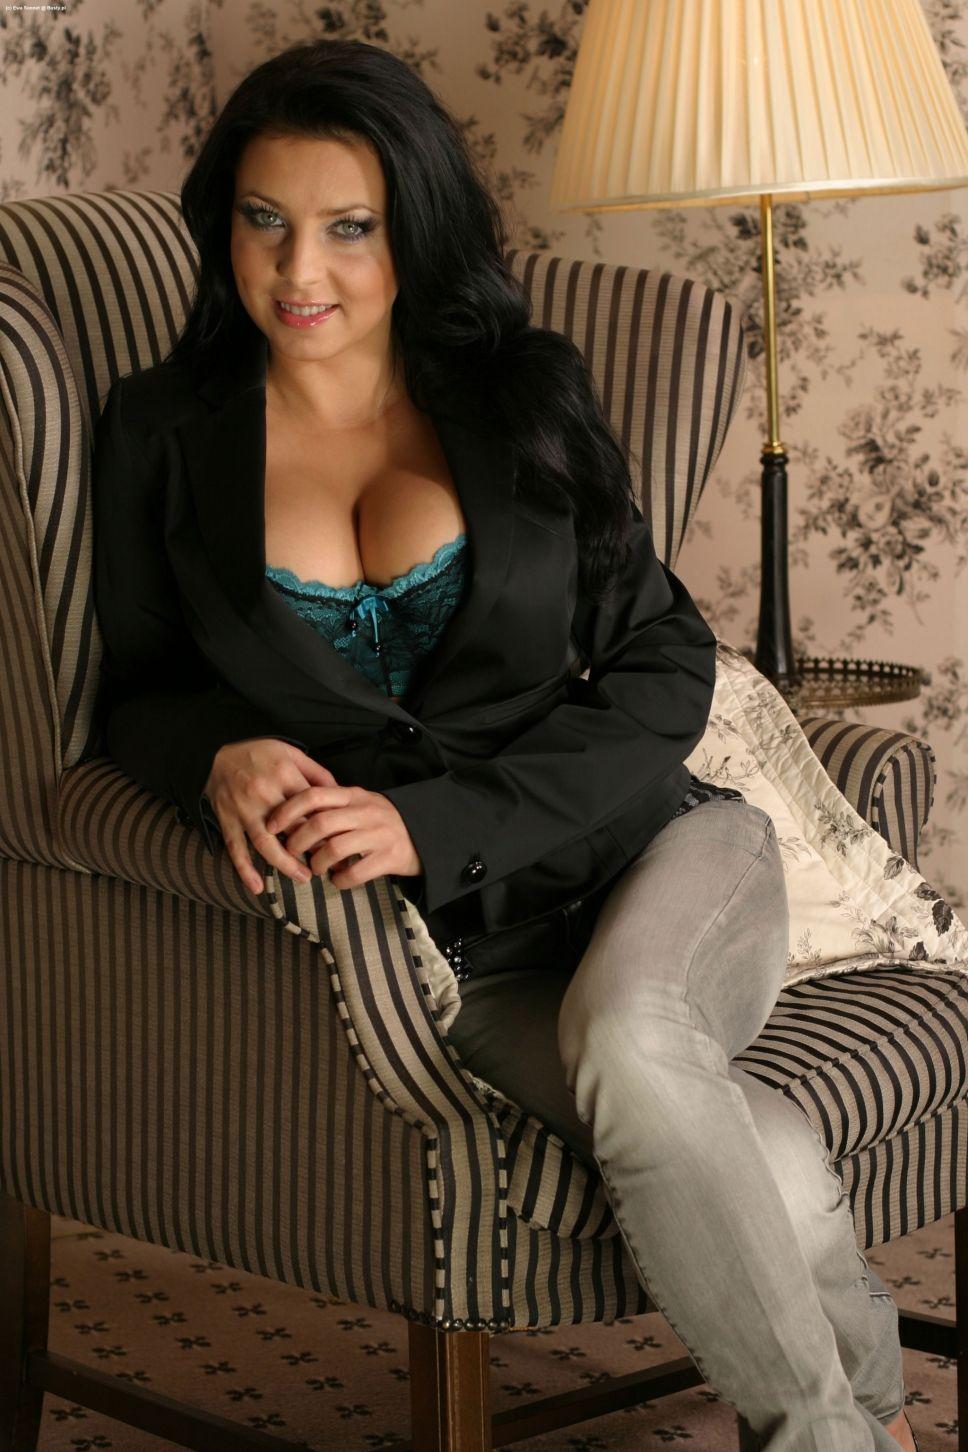 Ewa Sonnet | Sonnets, Curvy beauty, Stunning women